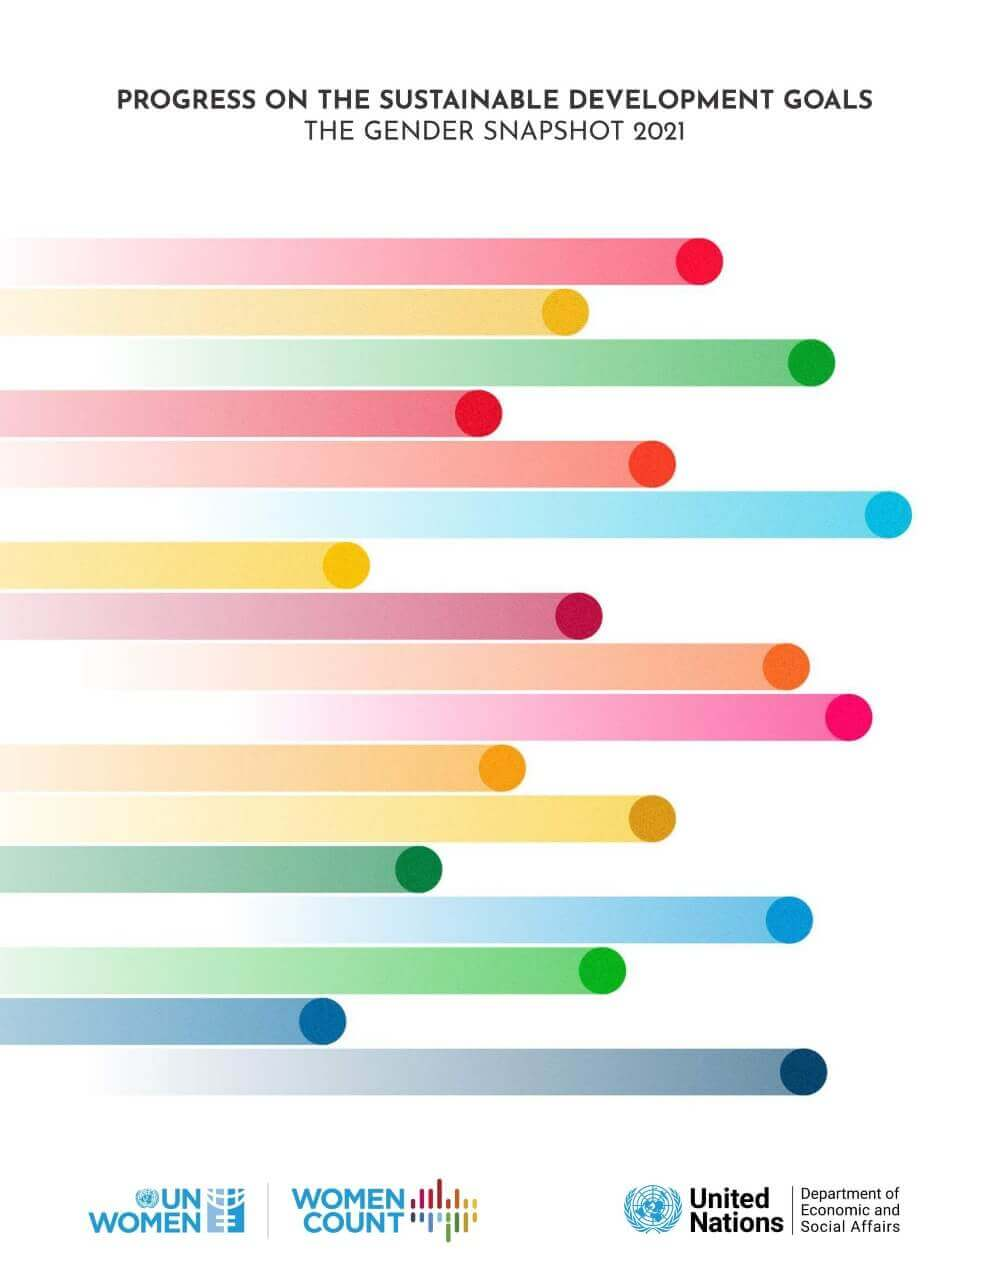 Progress on the Sustainable Development Goals - The gender snapshot 2021